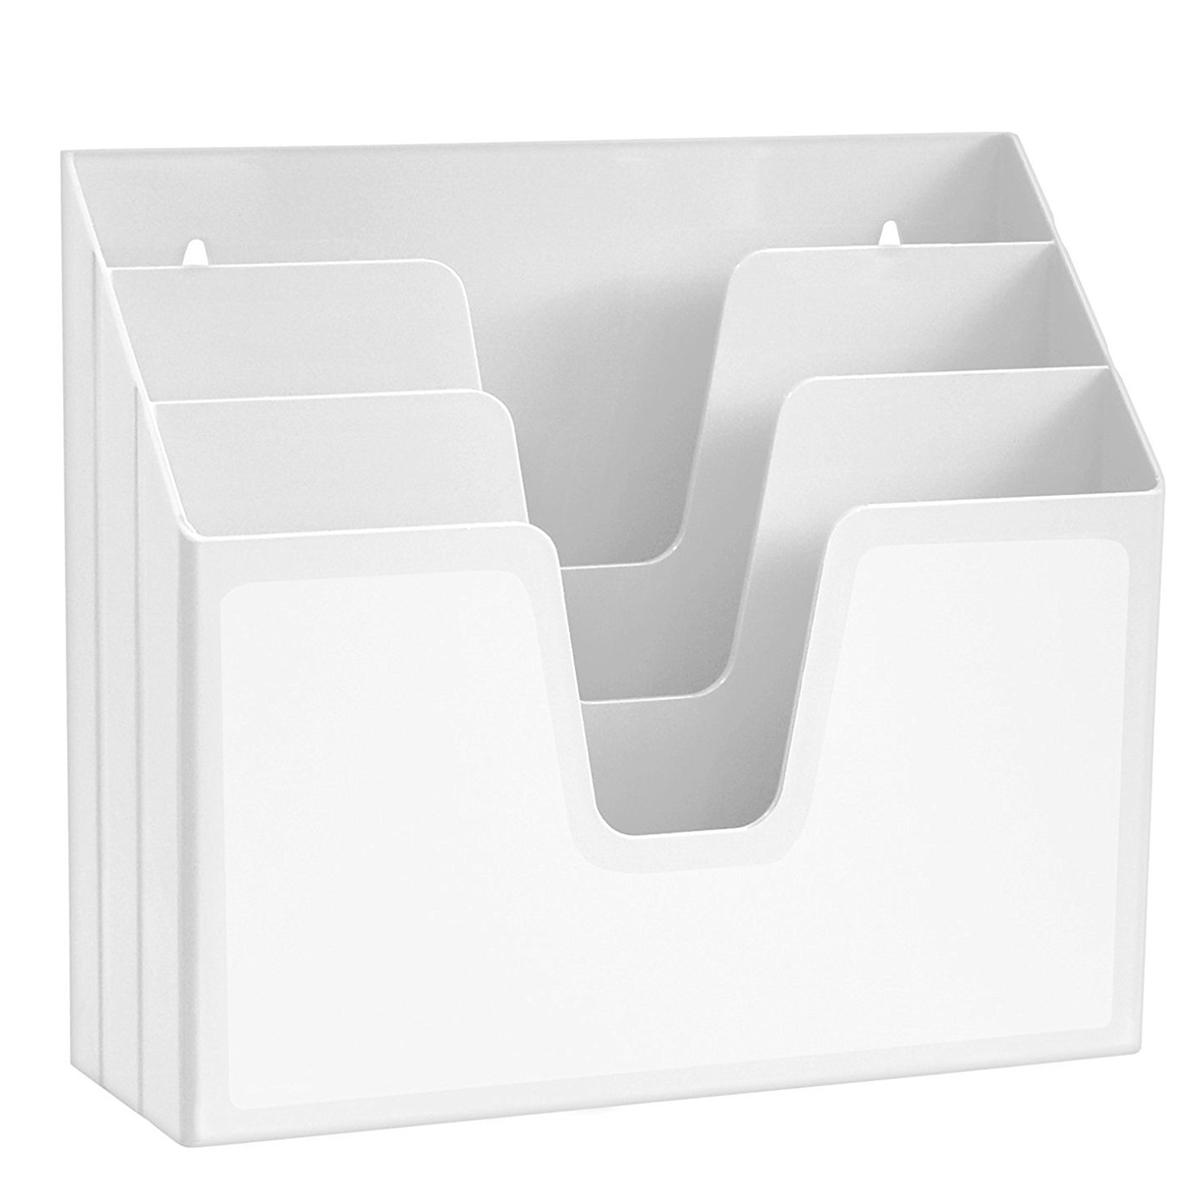 Acrimet Horizontal Triple File Folder Organizer (Solid White Color)